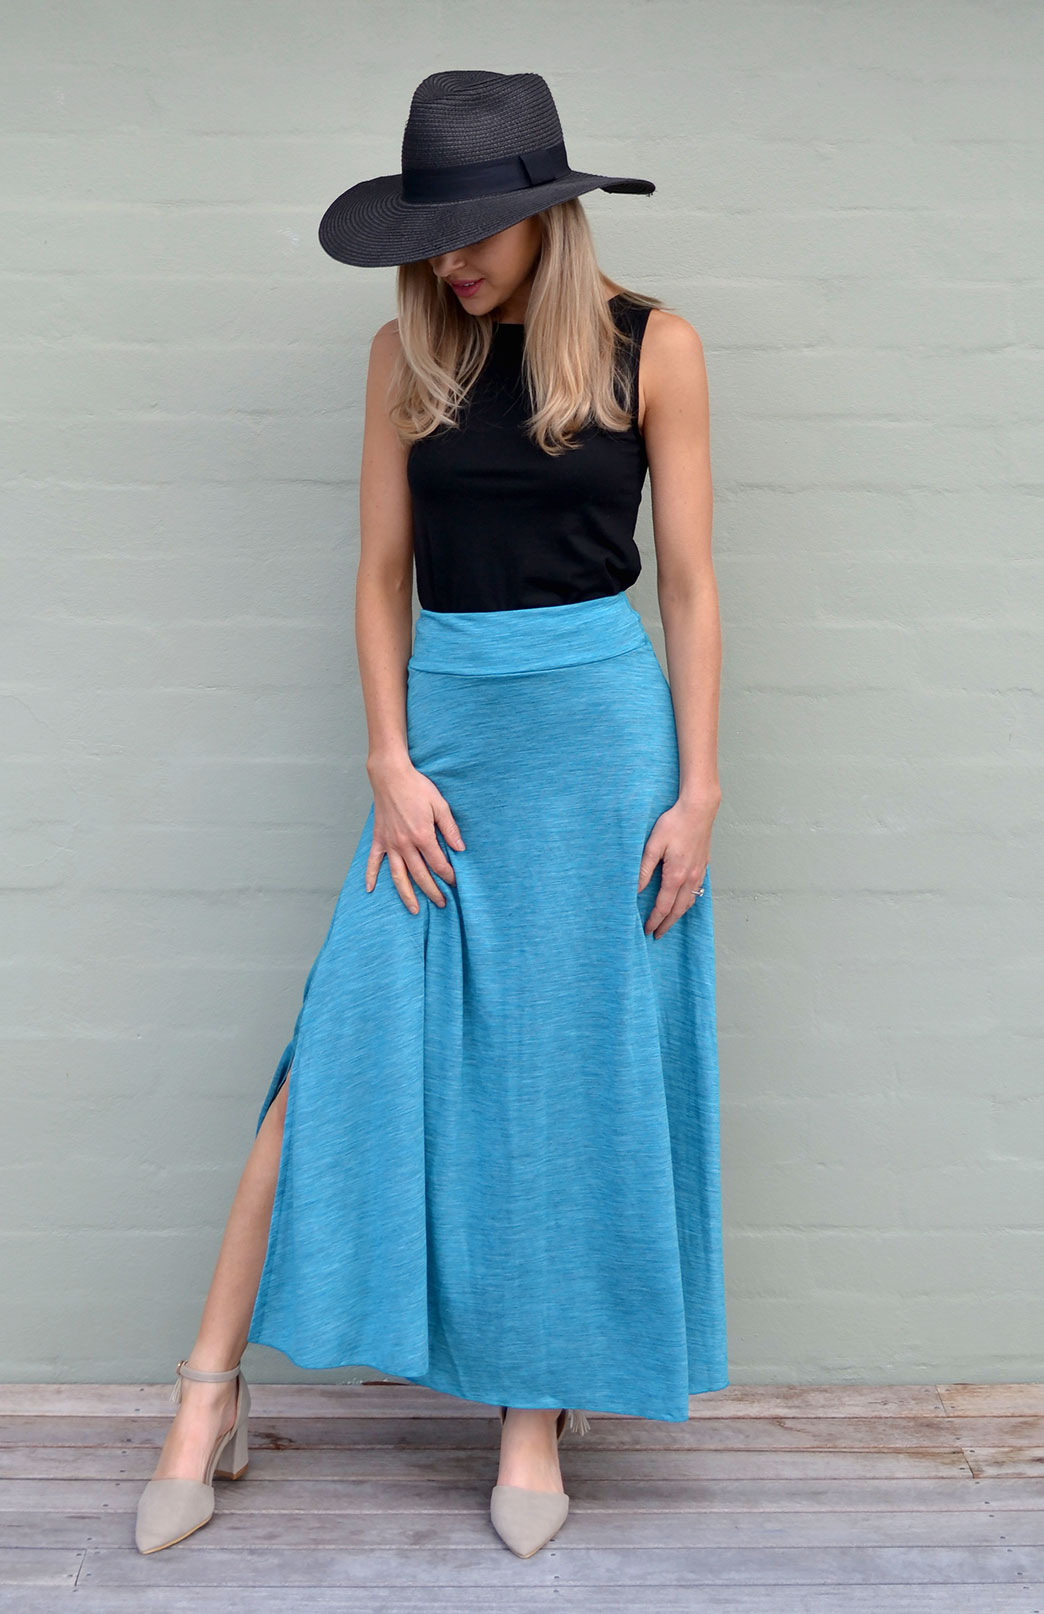 Marion Maxi Skirt - Women's Flame Red Merino Wool Maxi Skirt - Smitten Merino Tasmania Australia